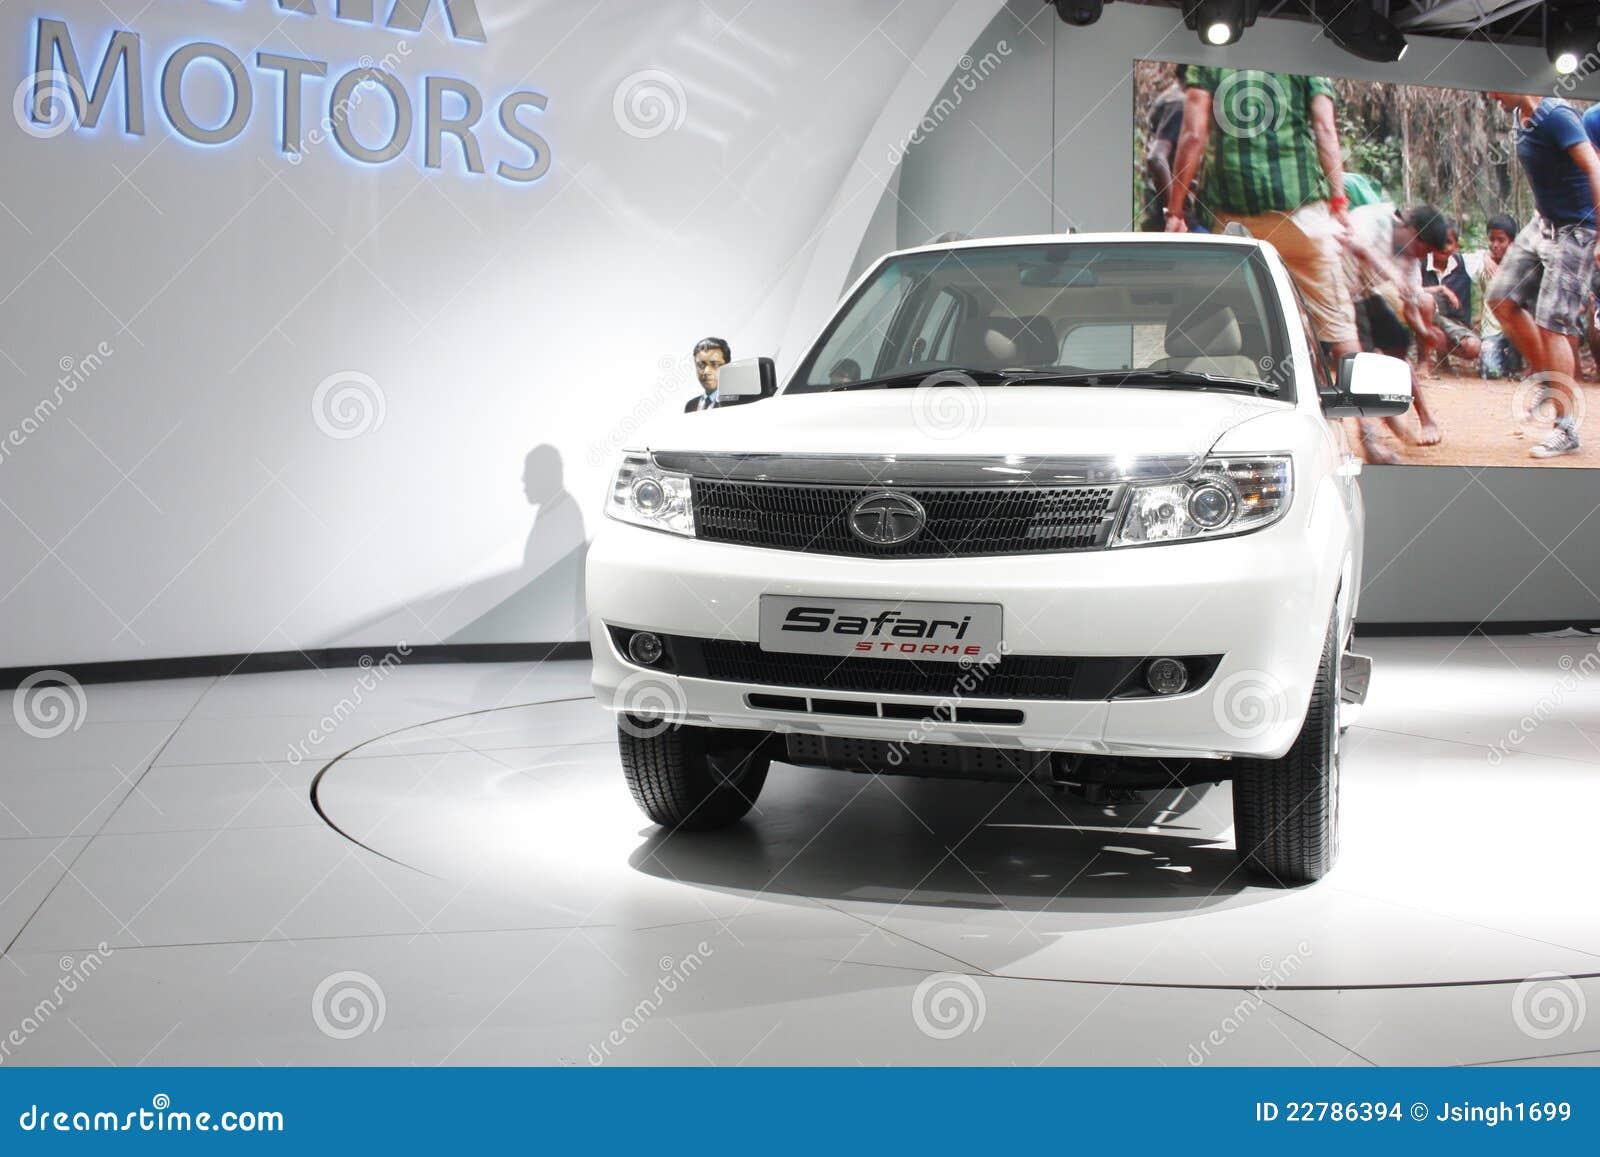 A Tata Safari Storme On Display At Auto Expo 2012 Editorial Stock